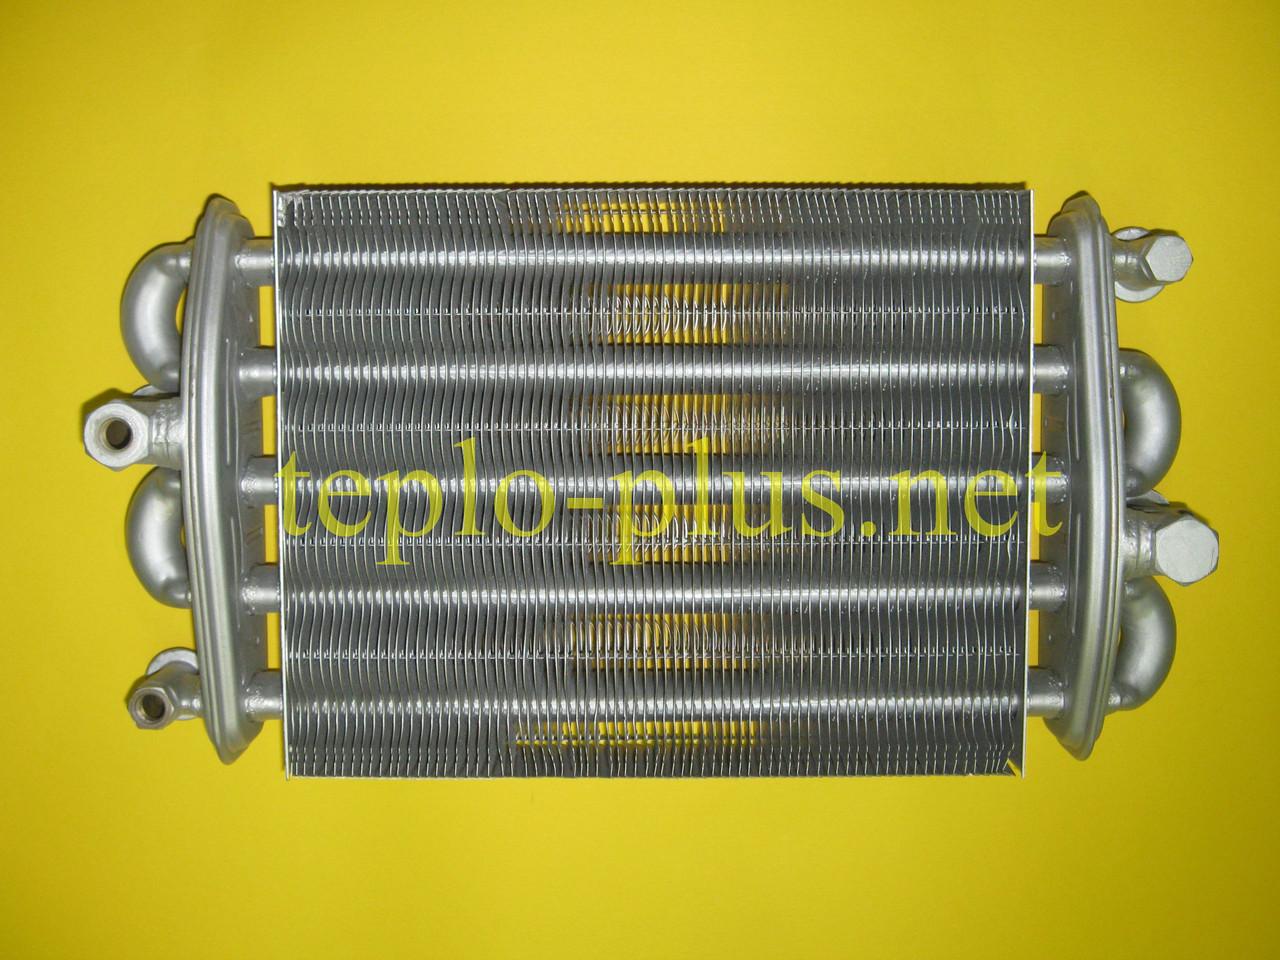 Теплообменник битермический 24 кВт 2.55.35.076.04 TeploWest (ТеплоВест), фото 2